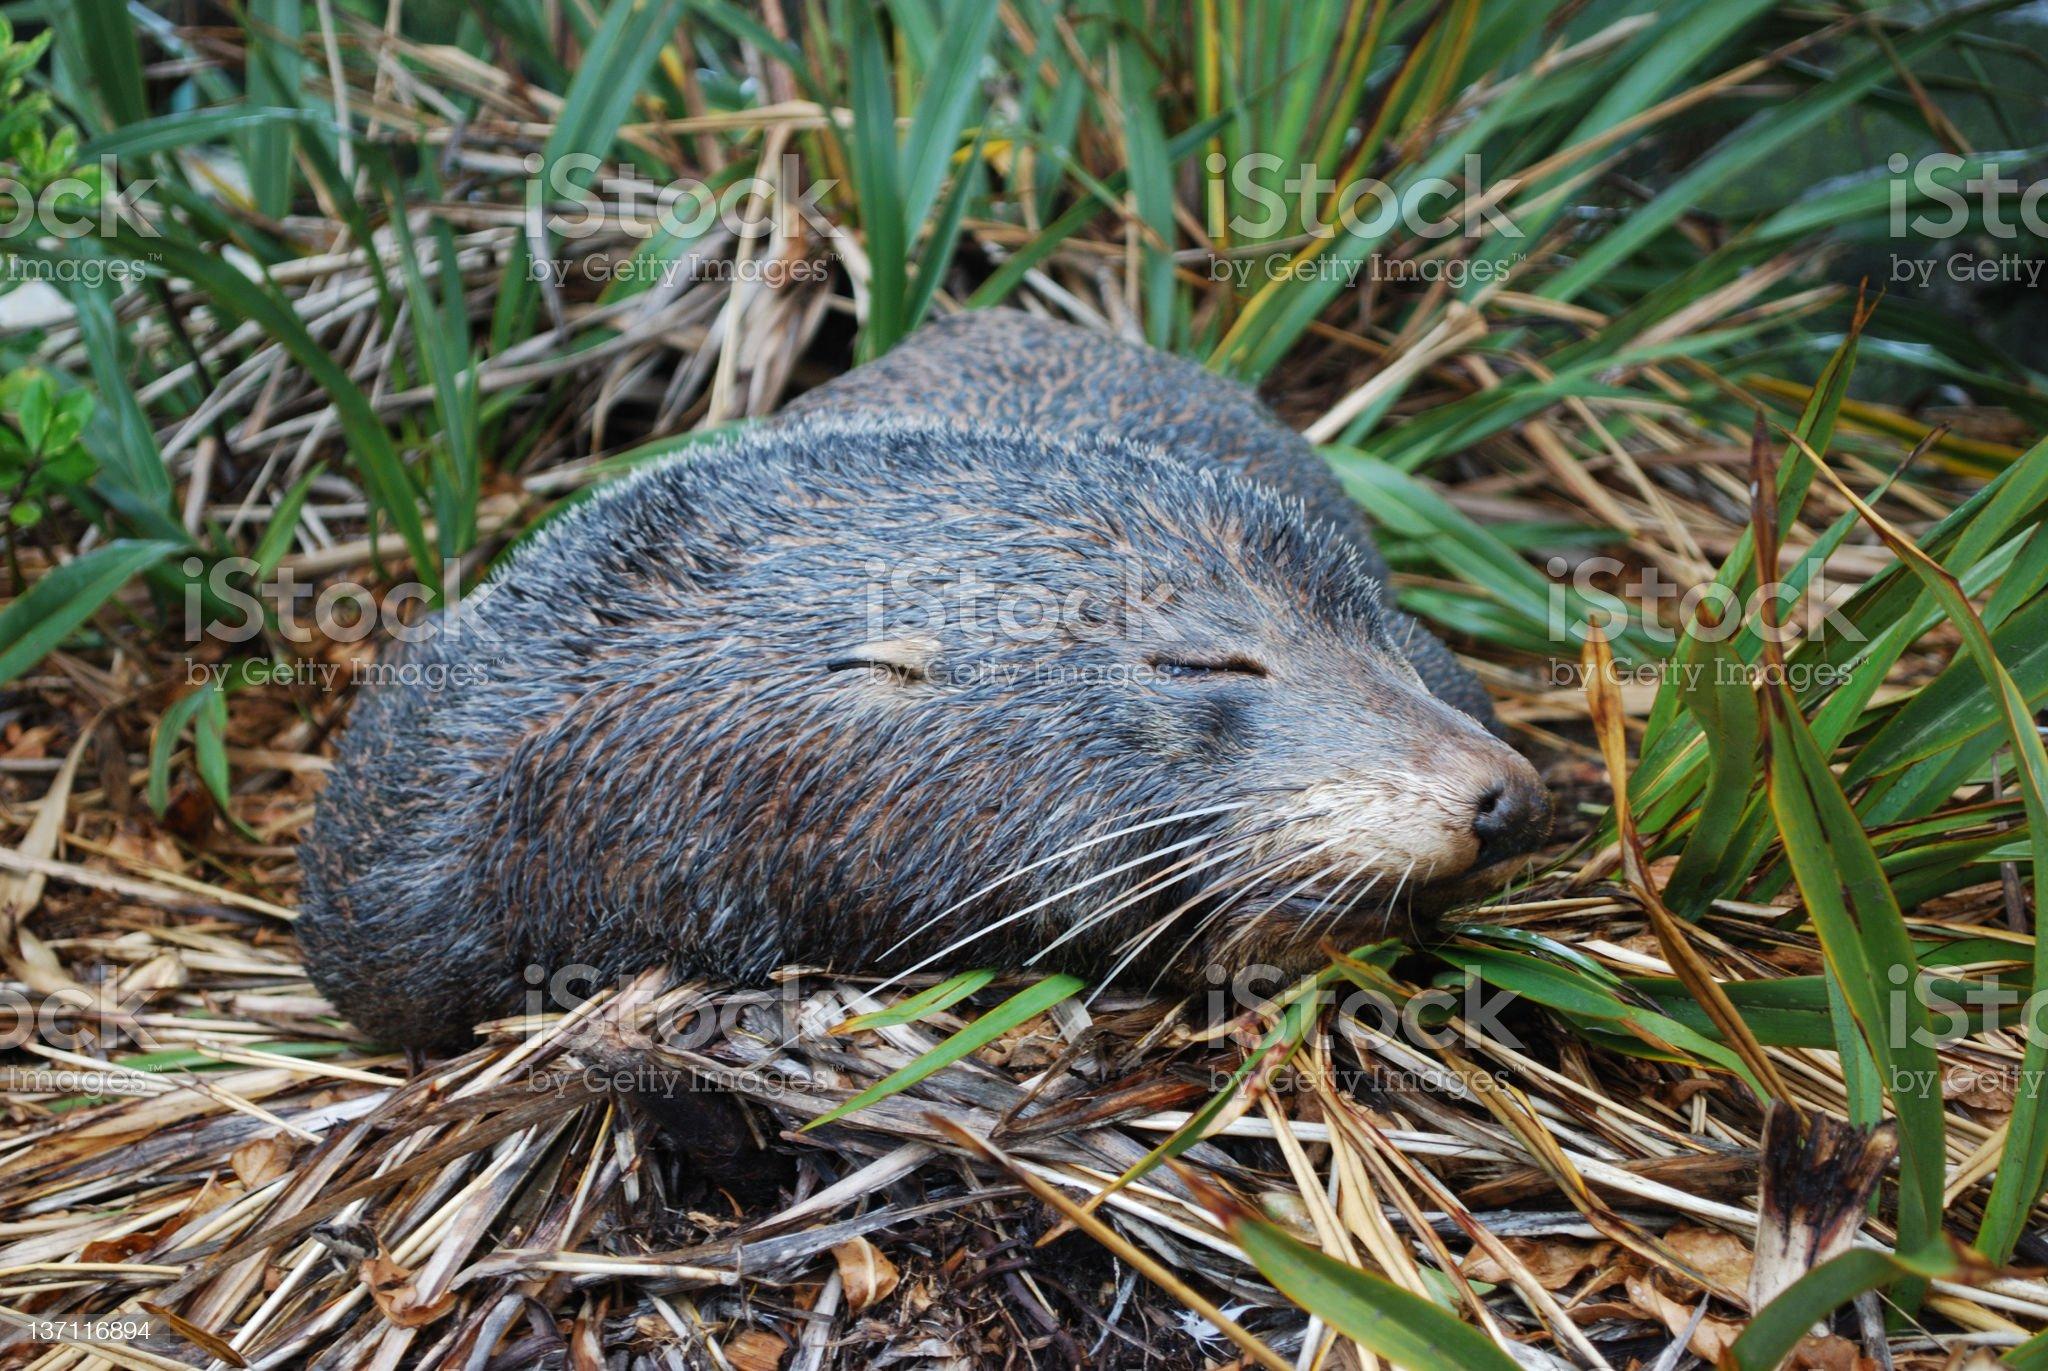 Sleeping Seal royalty-free stock photo